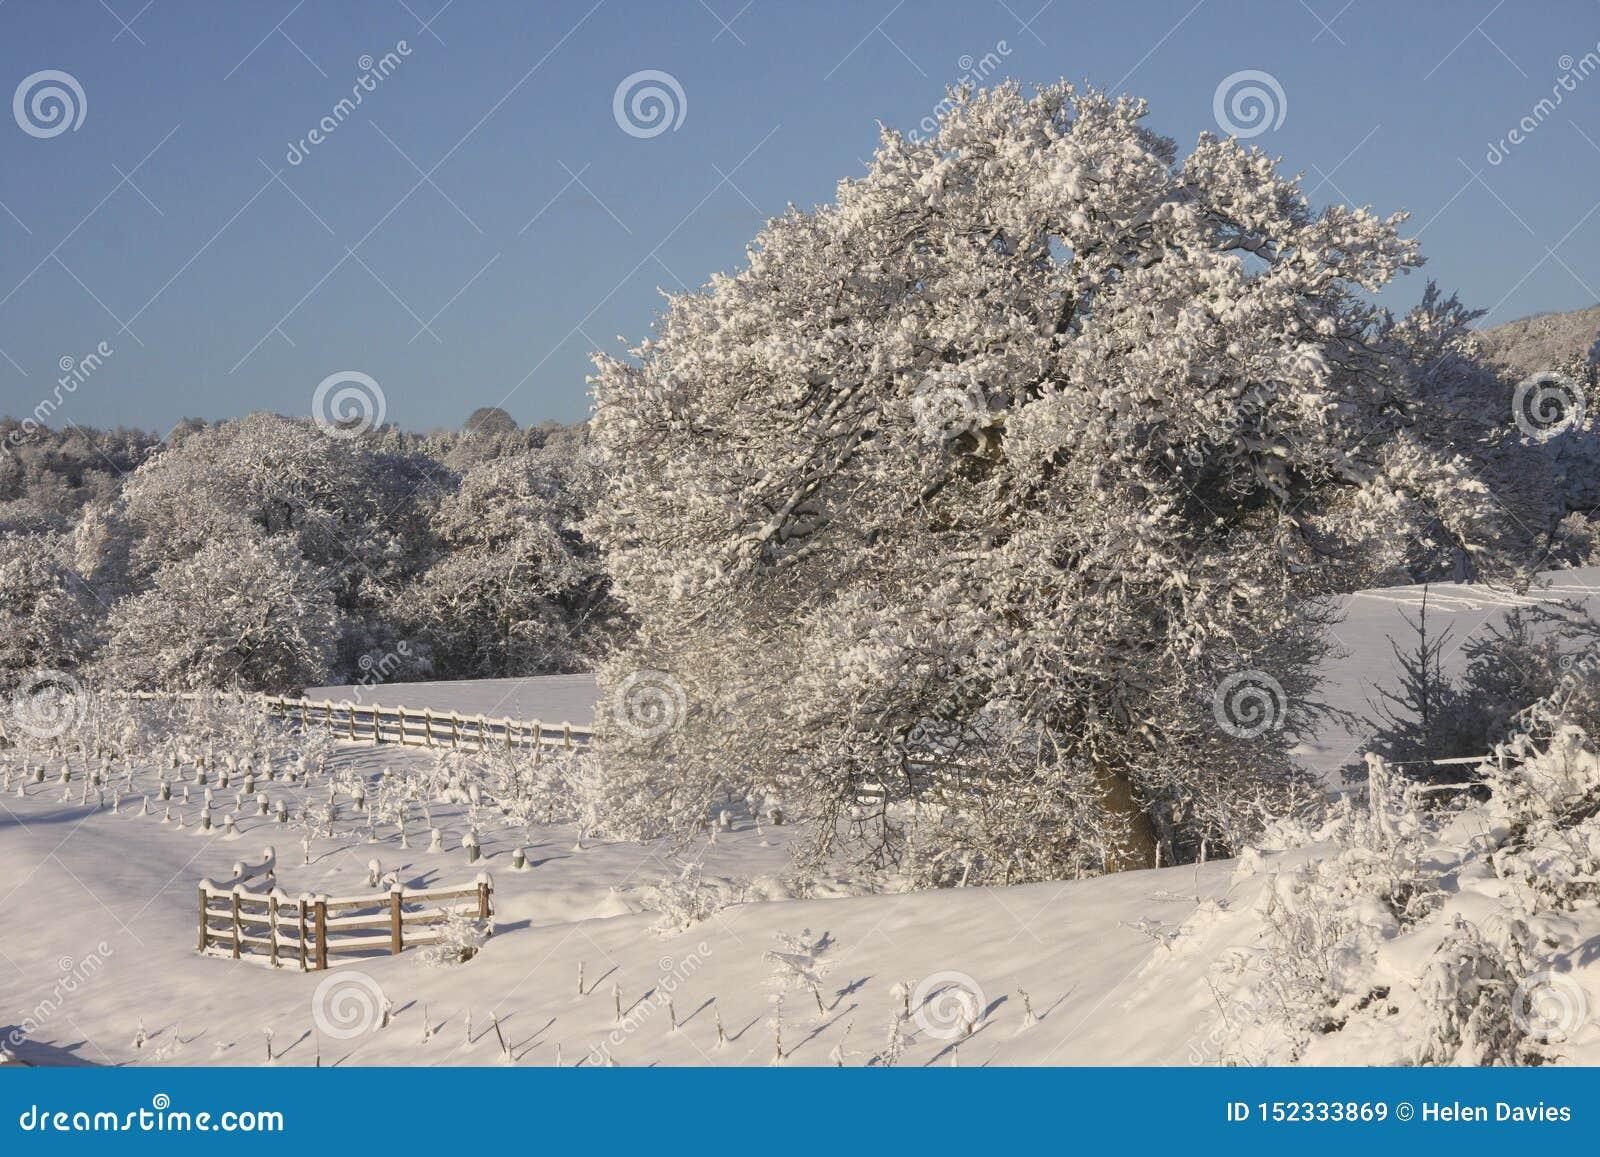 Winter Snow landscape, Cardiff, UK